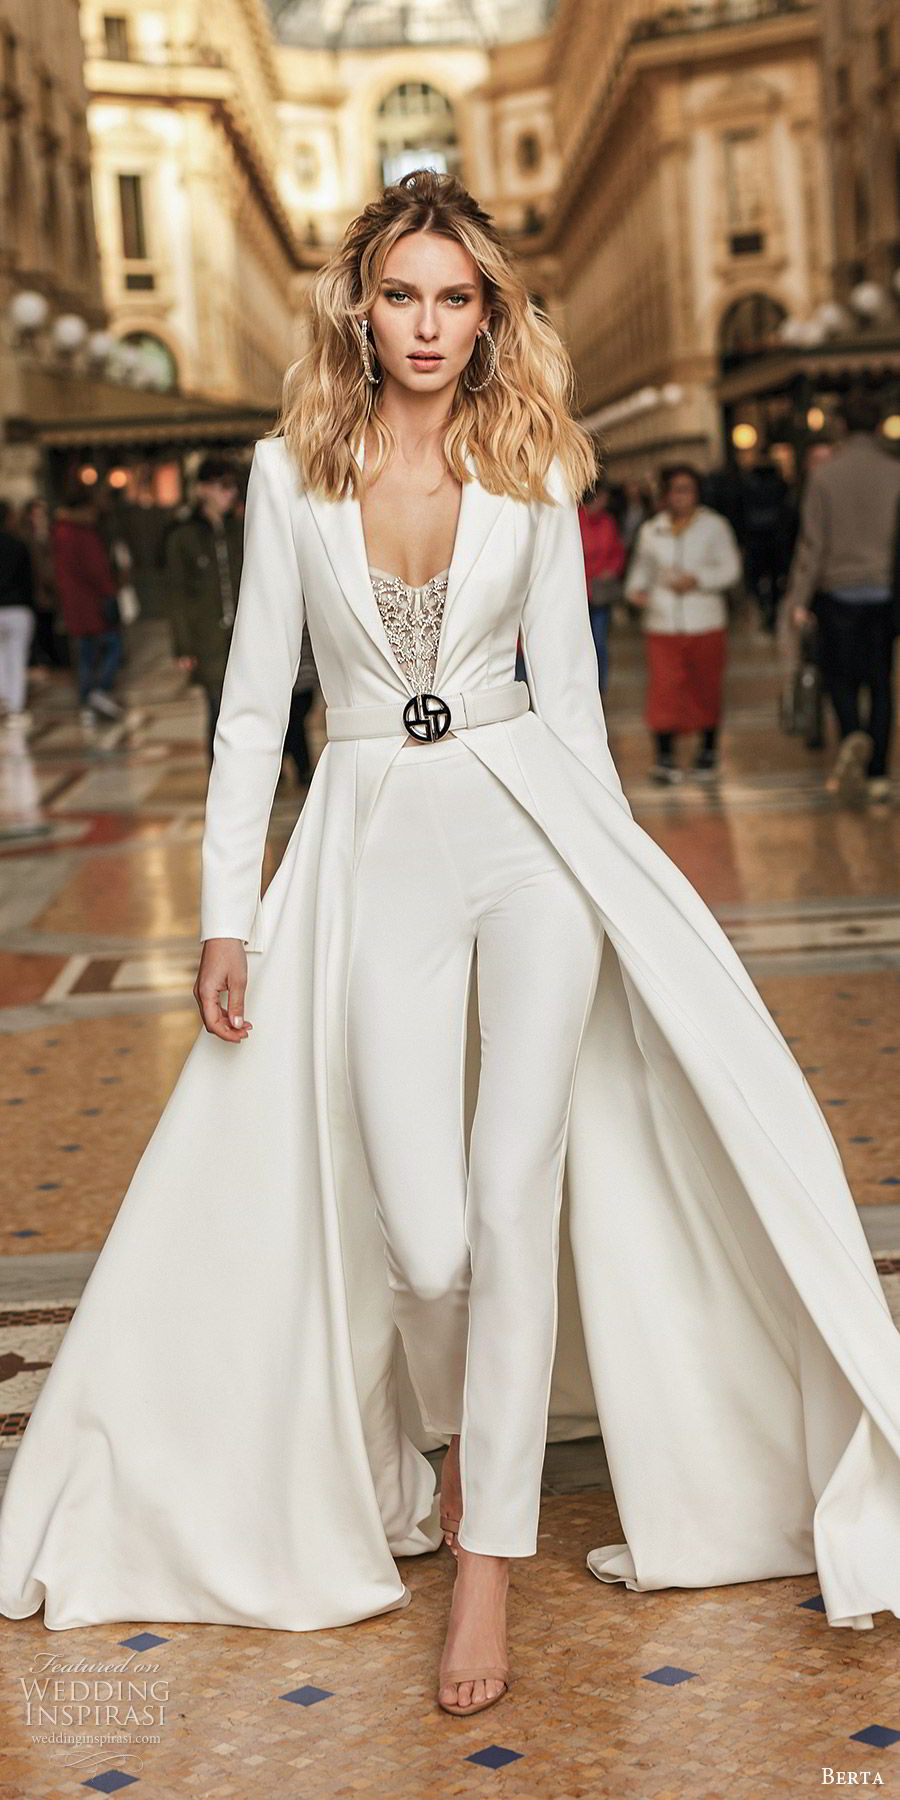 berta spring 2020 bridal long sleeve full length jacket minimal pant suit wedding dress (10) modern chic clean mv